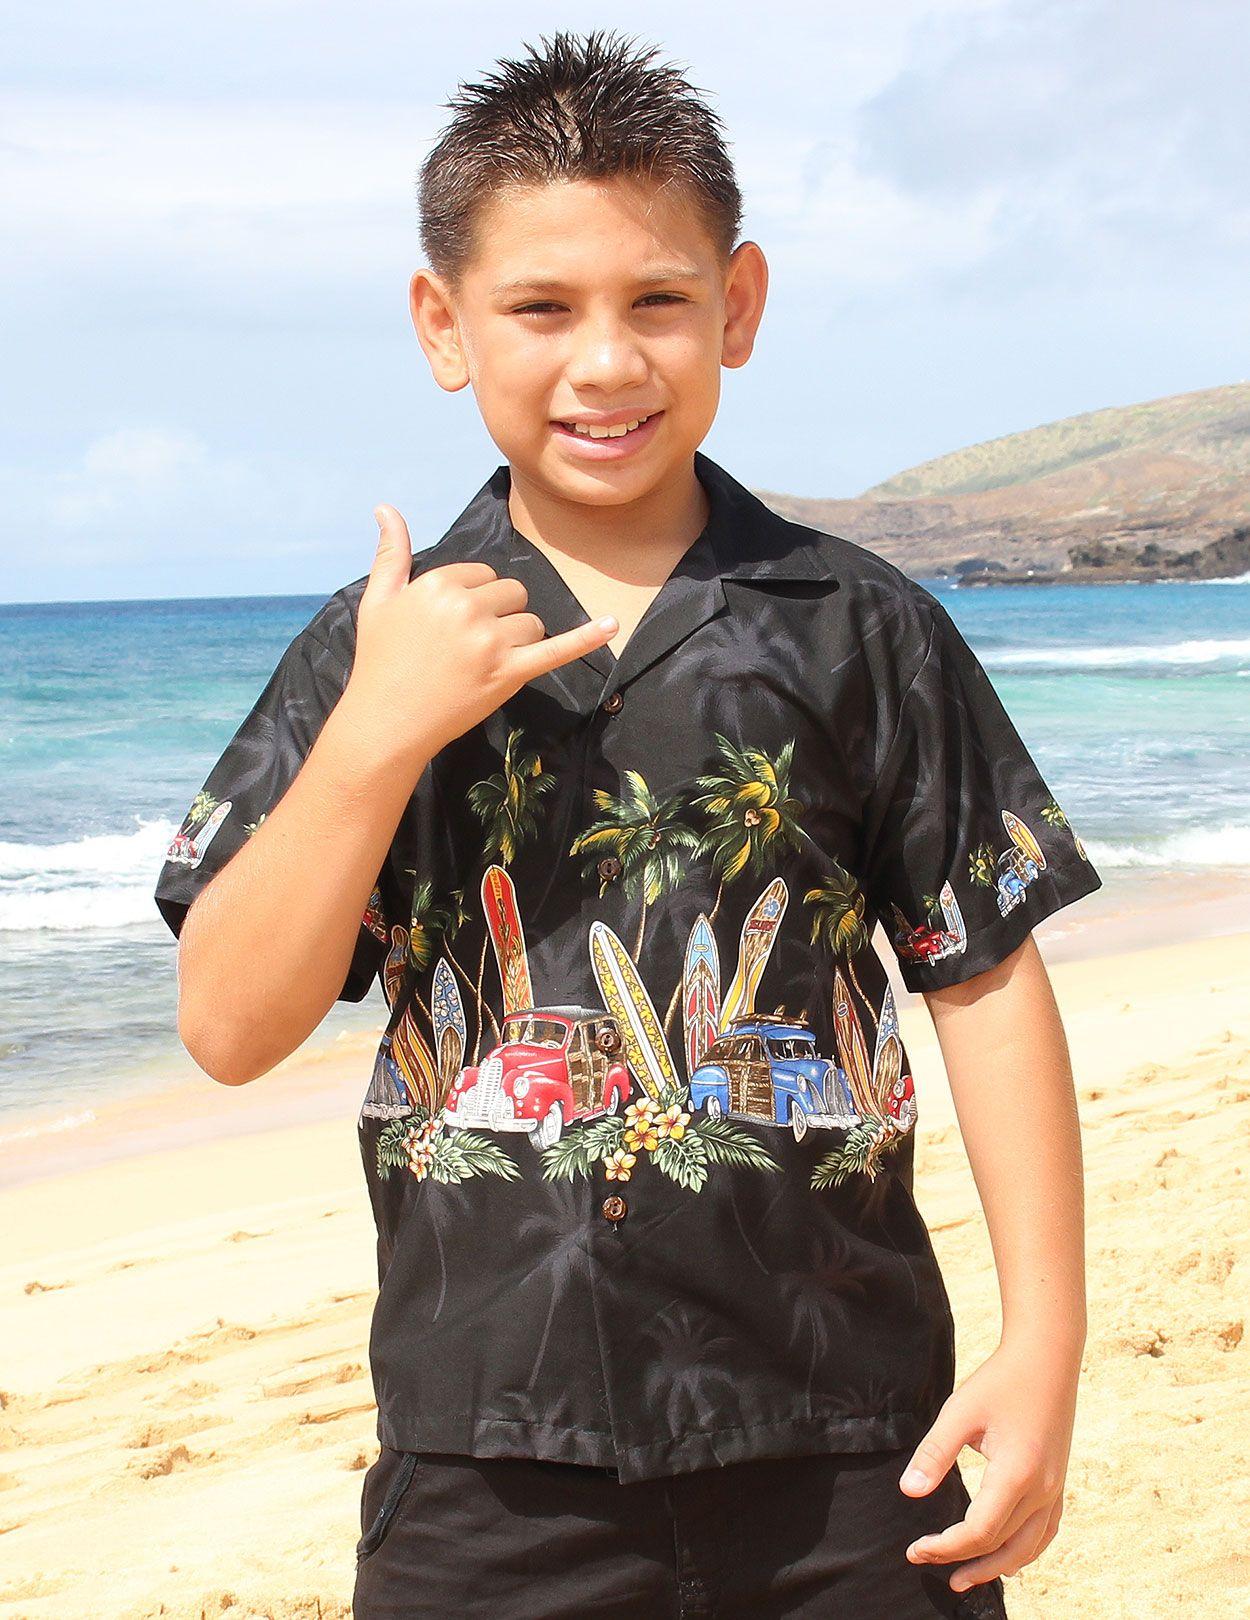 f0ca9141f19 Aloha Boy's Shirt - Woody Car : Shaka Time Hawaii Clothing Store ...